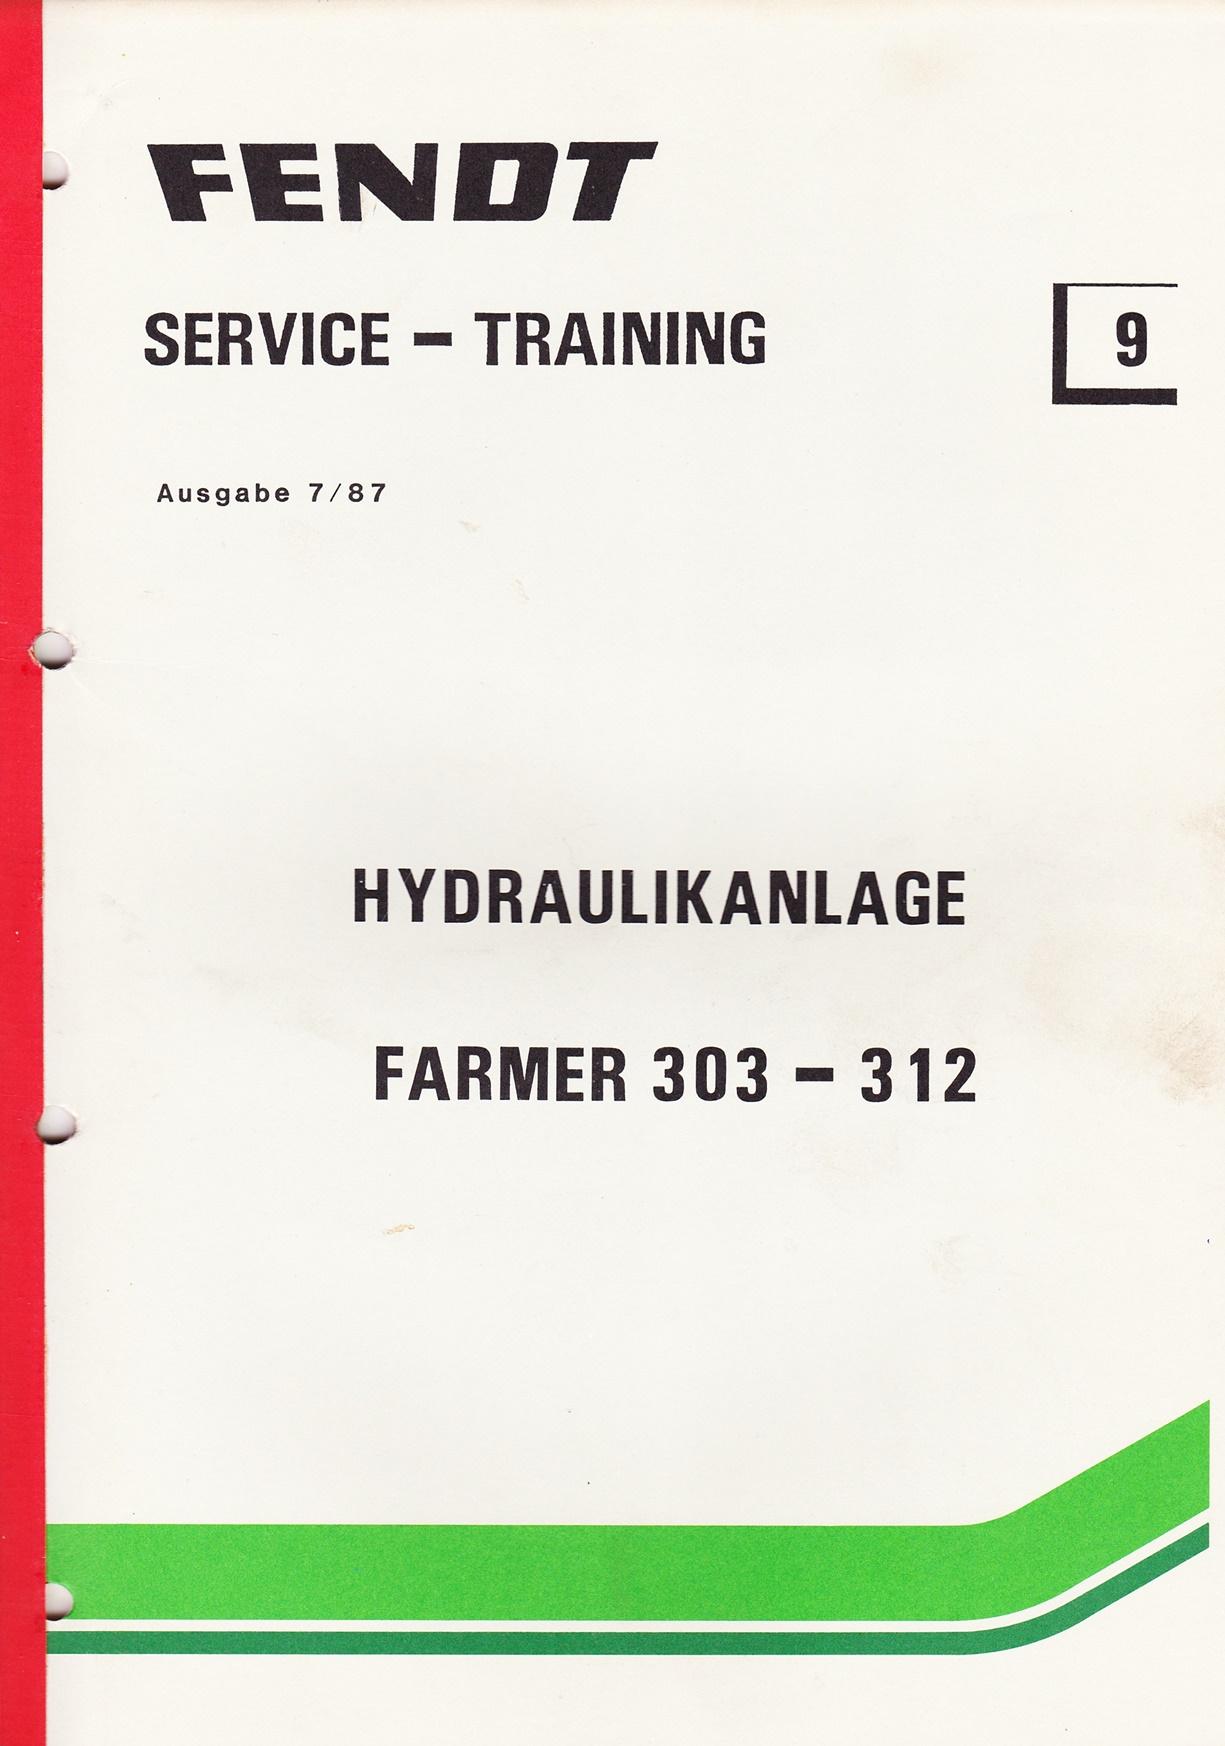 Fendt  Service und Training Nr. 9, Farmer 303 - 312